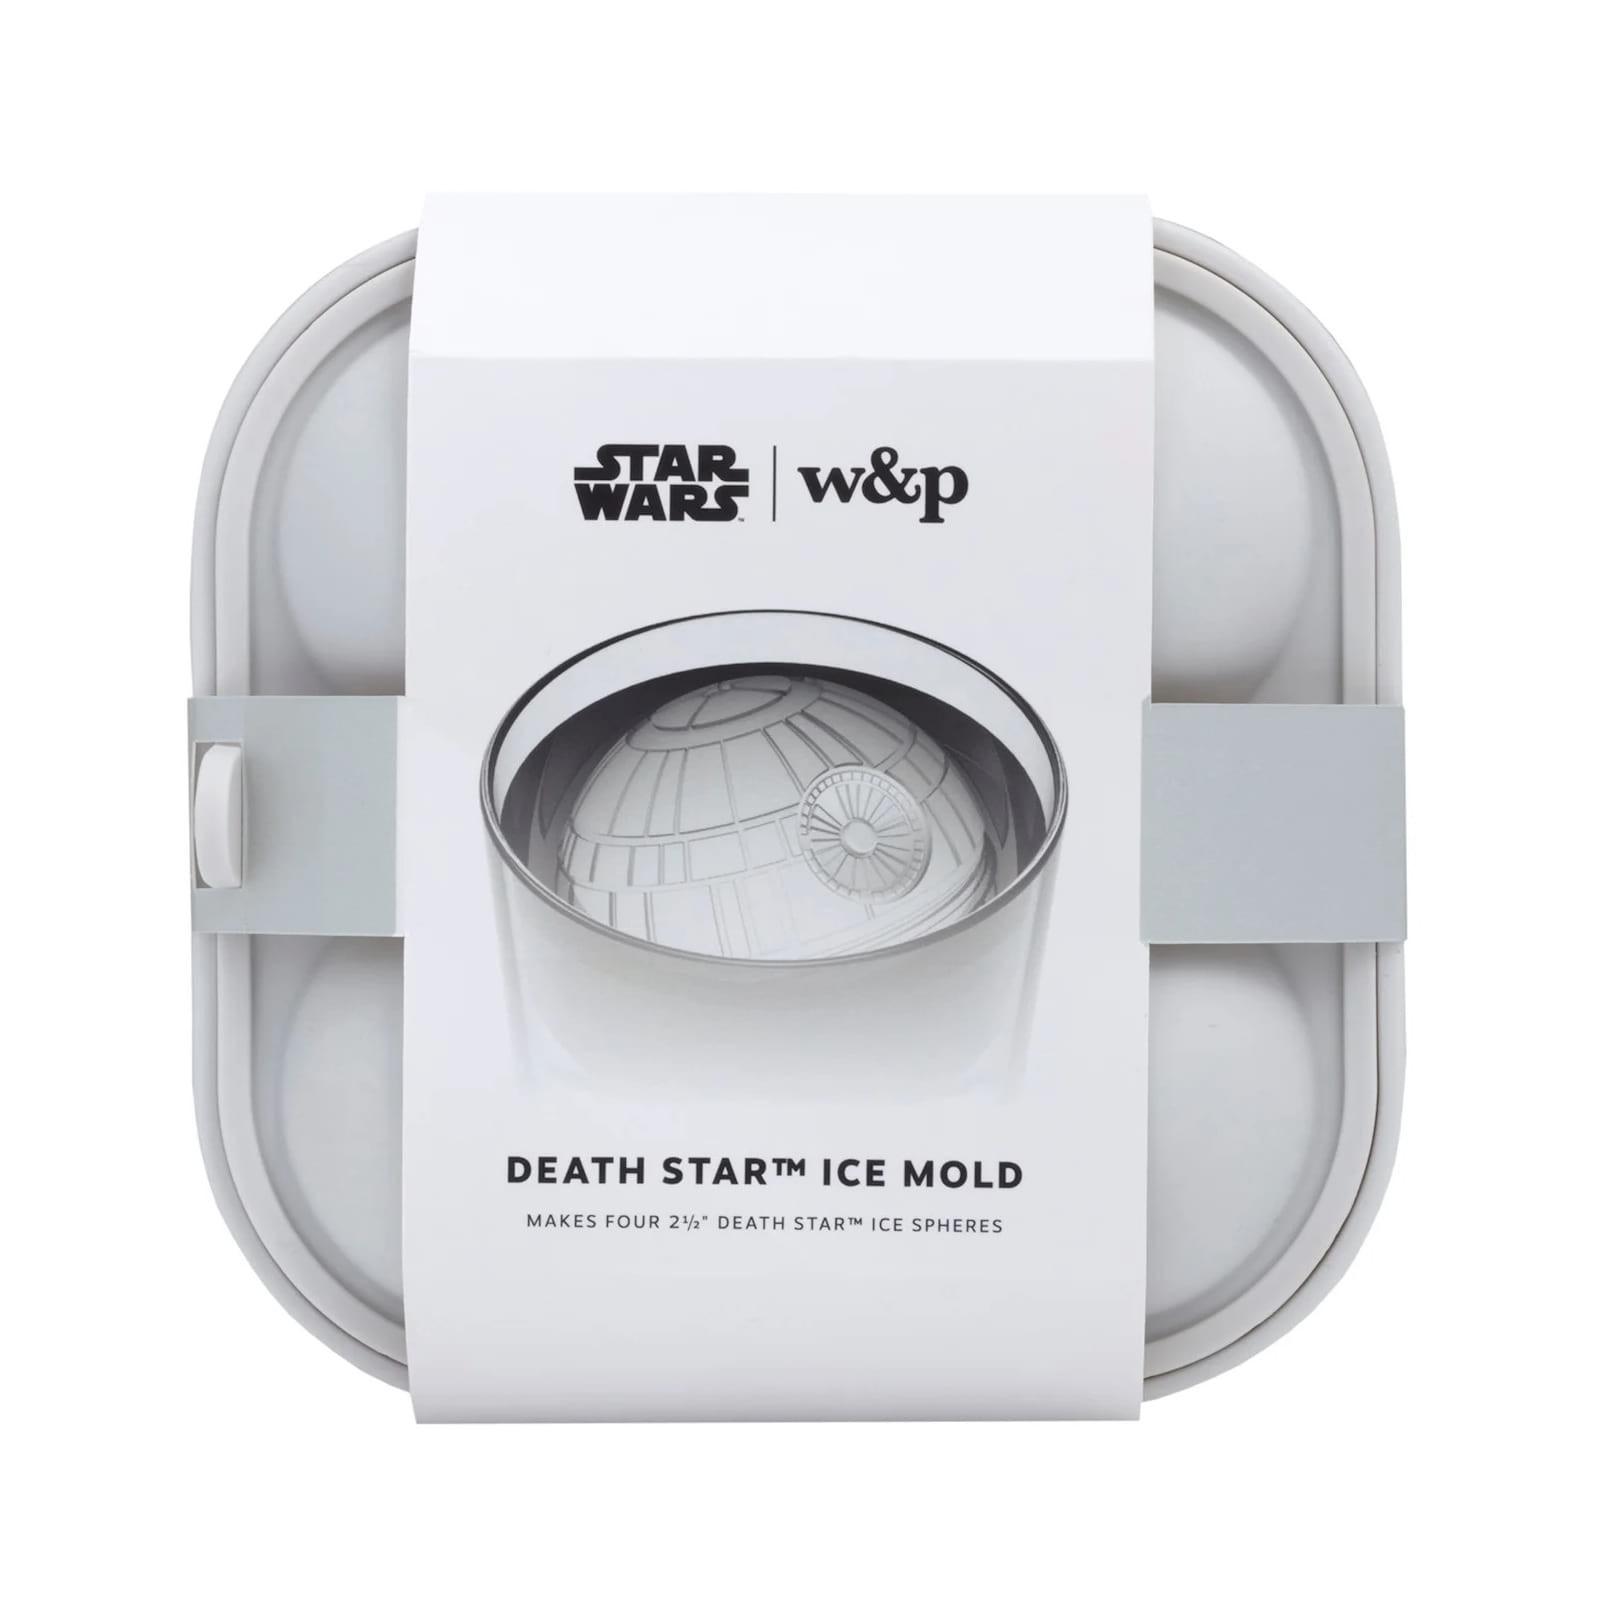 Death Star™ Sphere Ice Tray (White) - W&P